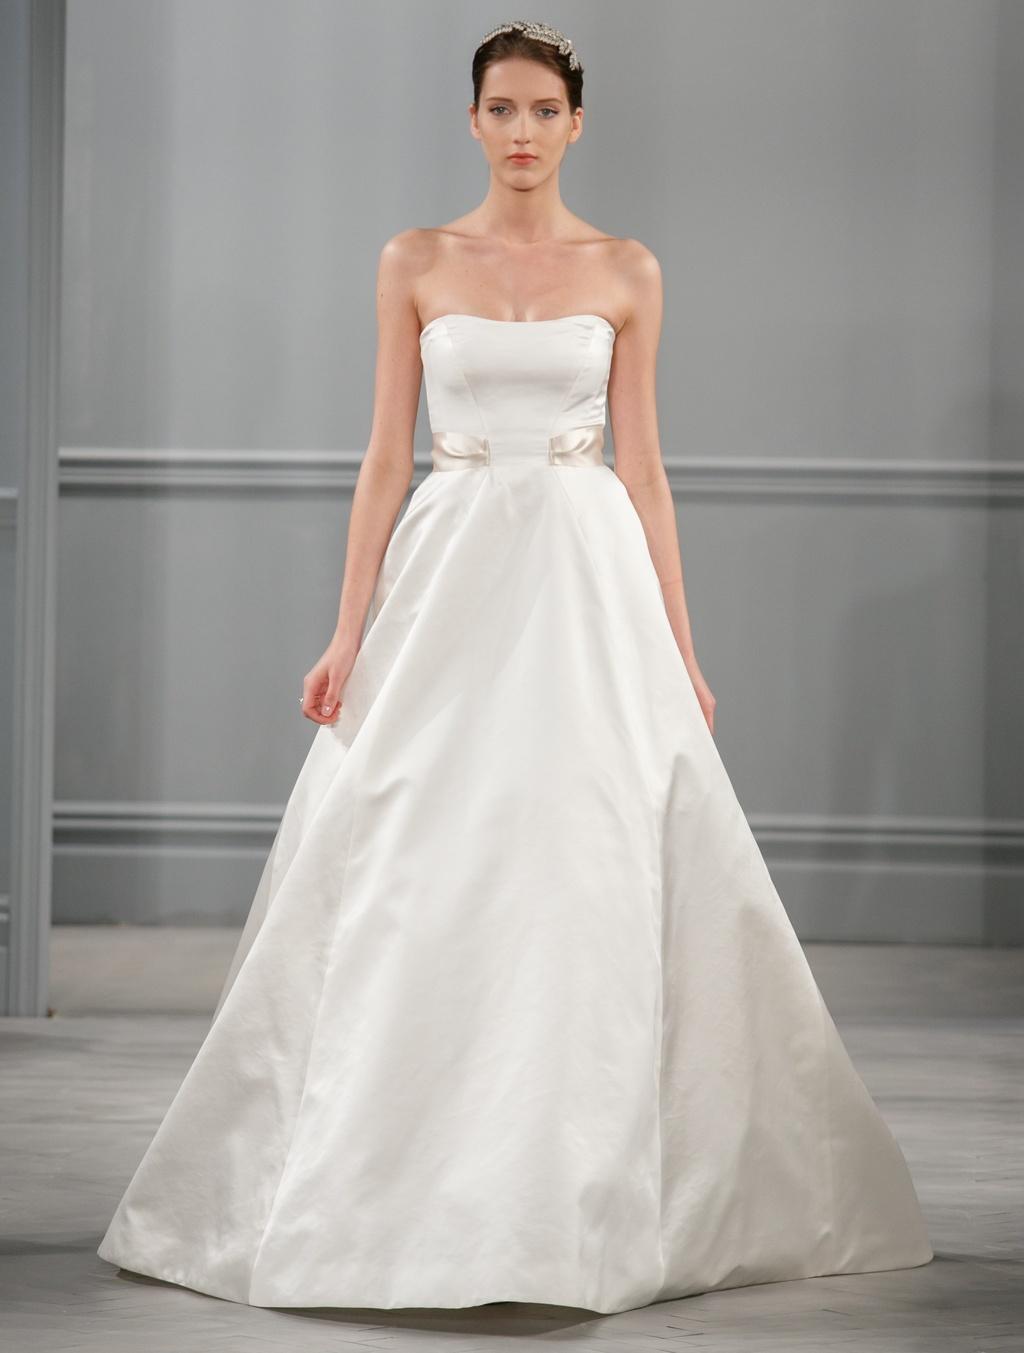 Spring-2014-wedding-dress-monique-lhuillier-bridal-satine.full